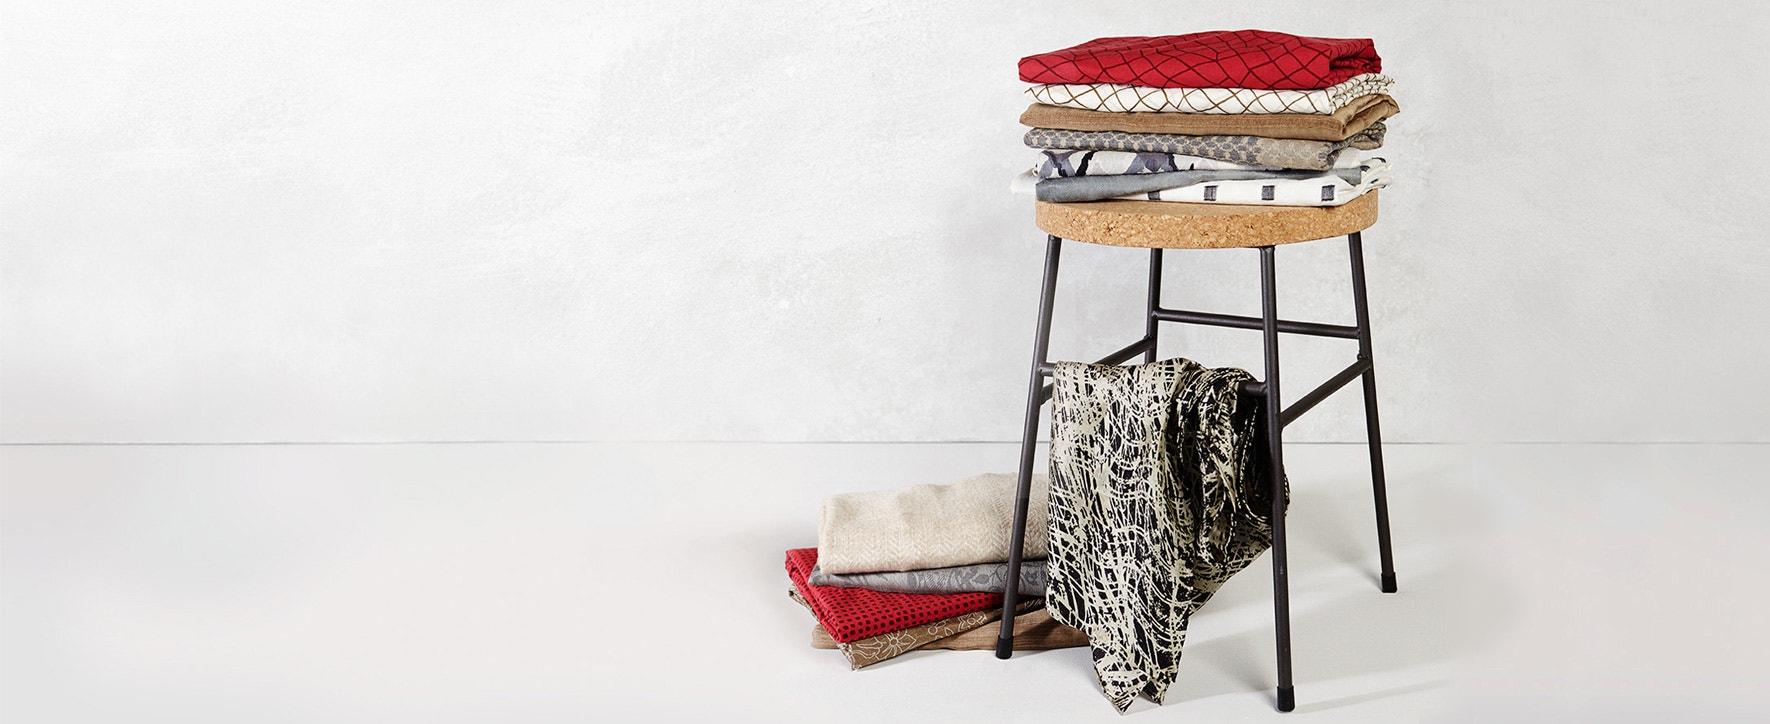 Schals, Loops & Tücher - Foto: GEPA - The Fair Trade Company / Julia von der Heide